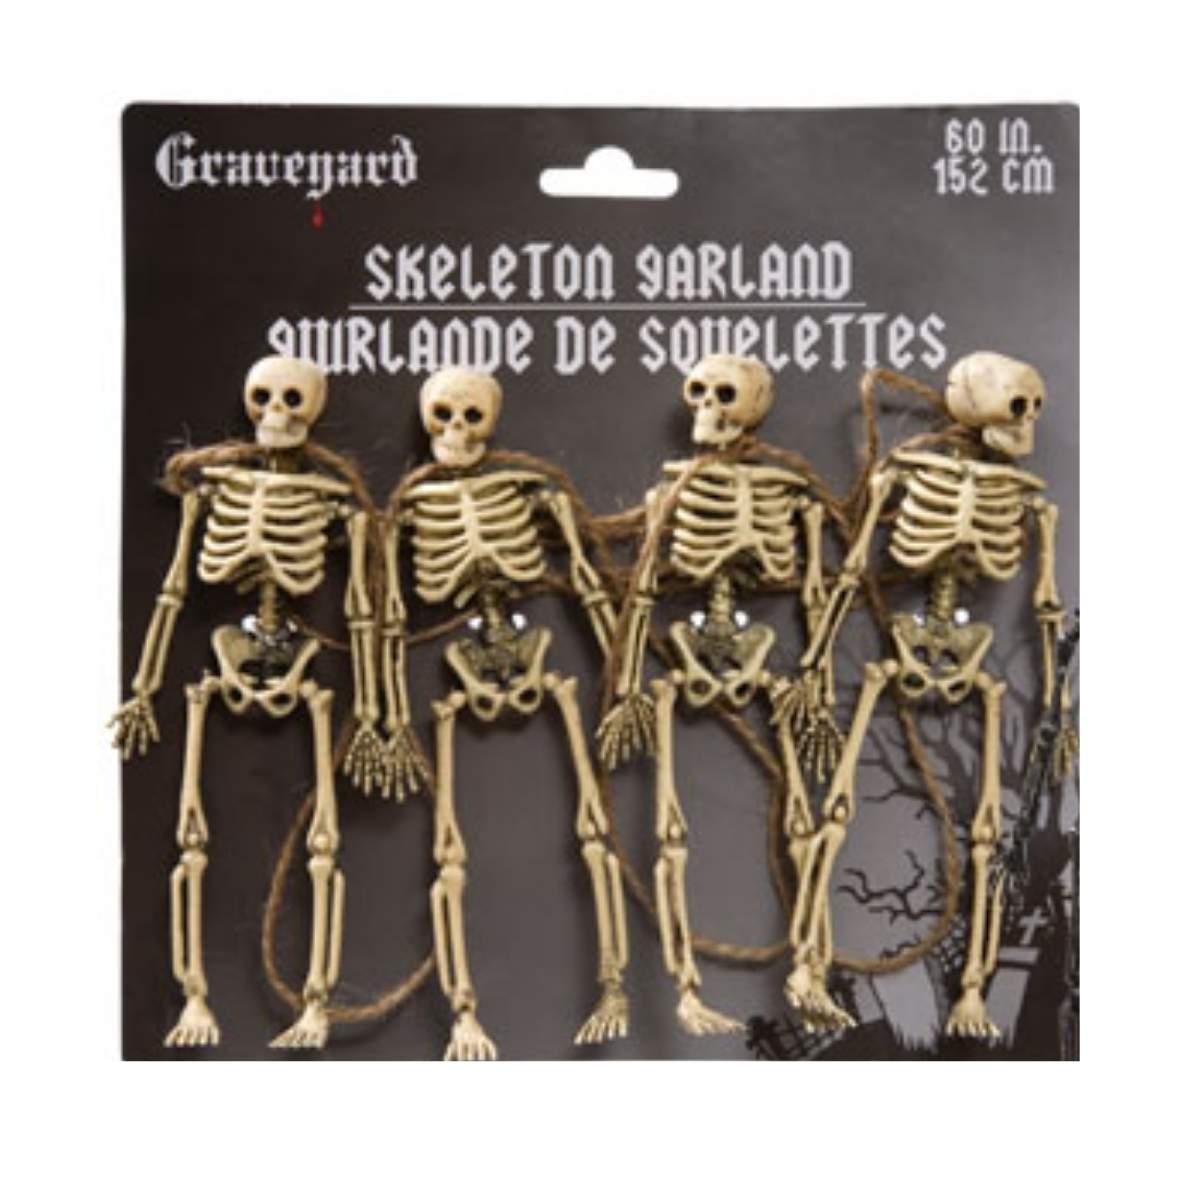 Enfeite Varal Esqueleto 152cm